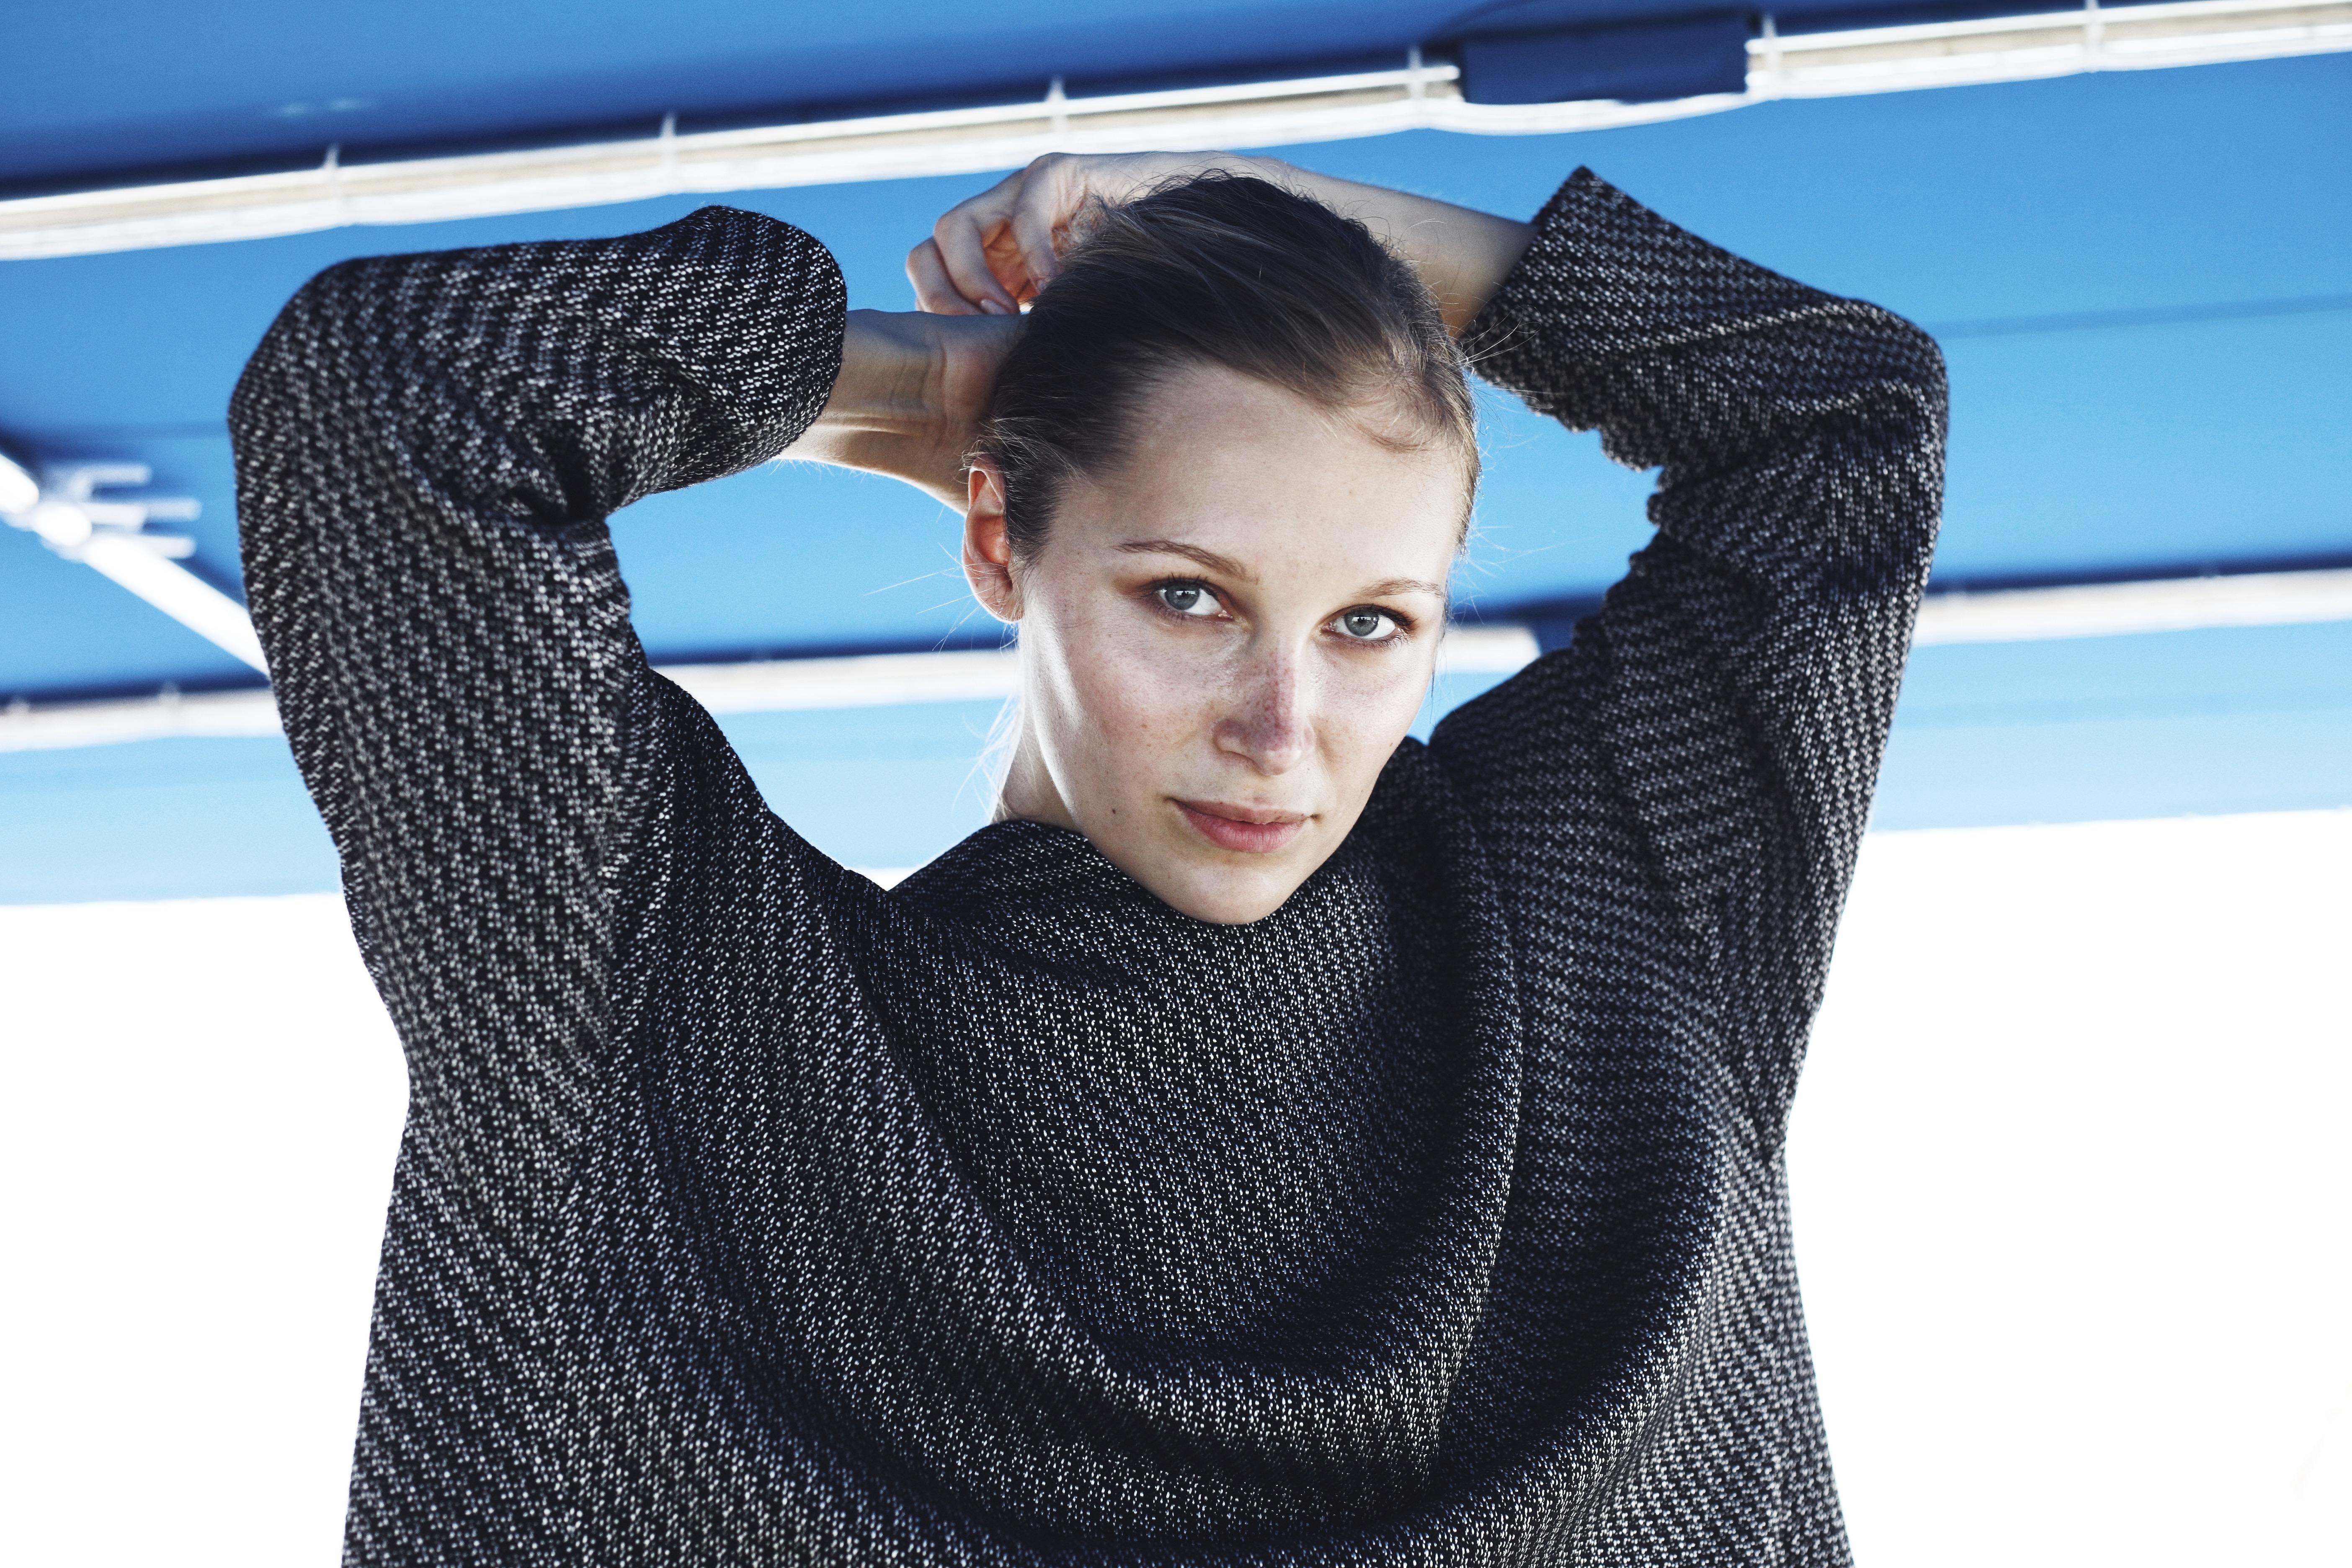 Ksenia Konoplyasova